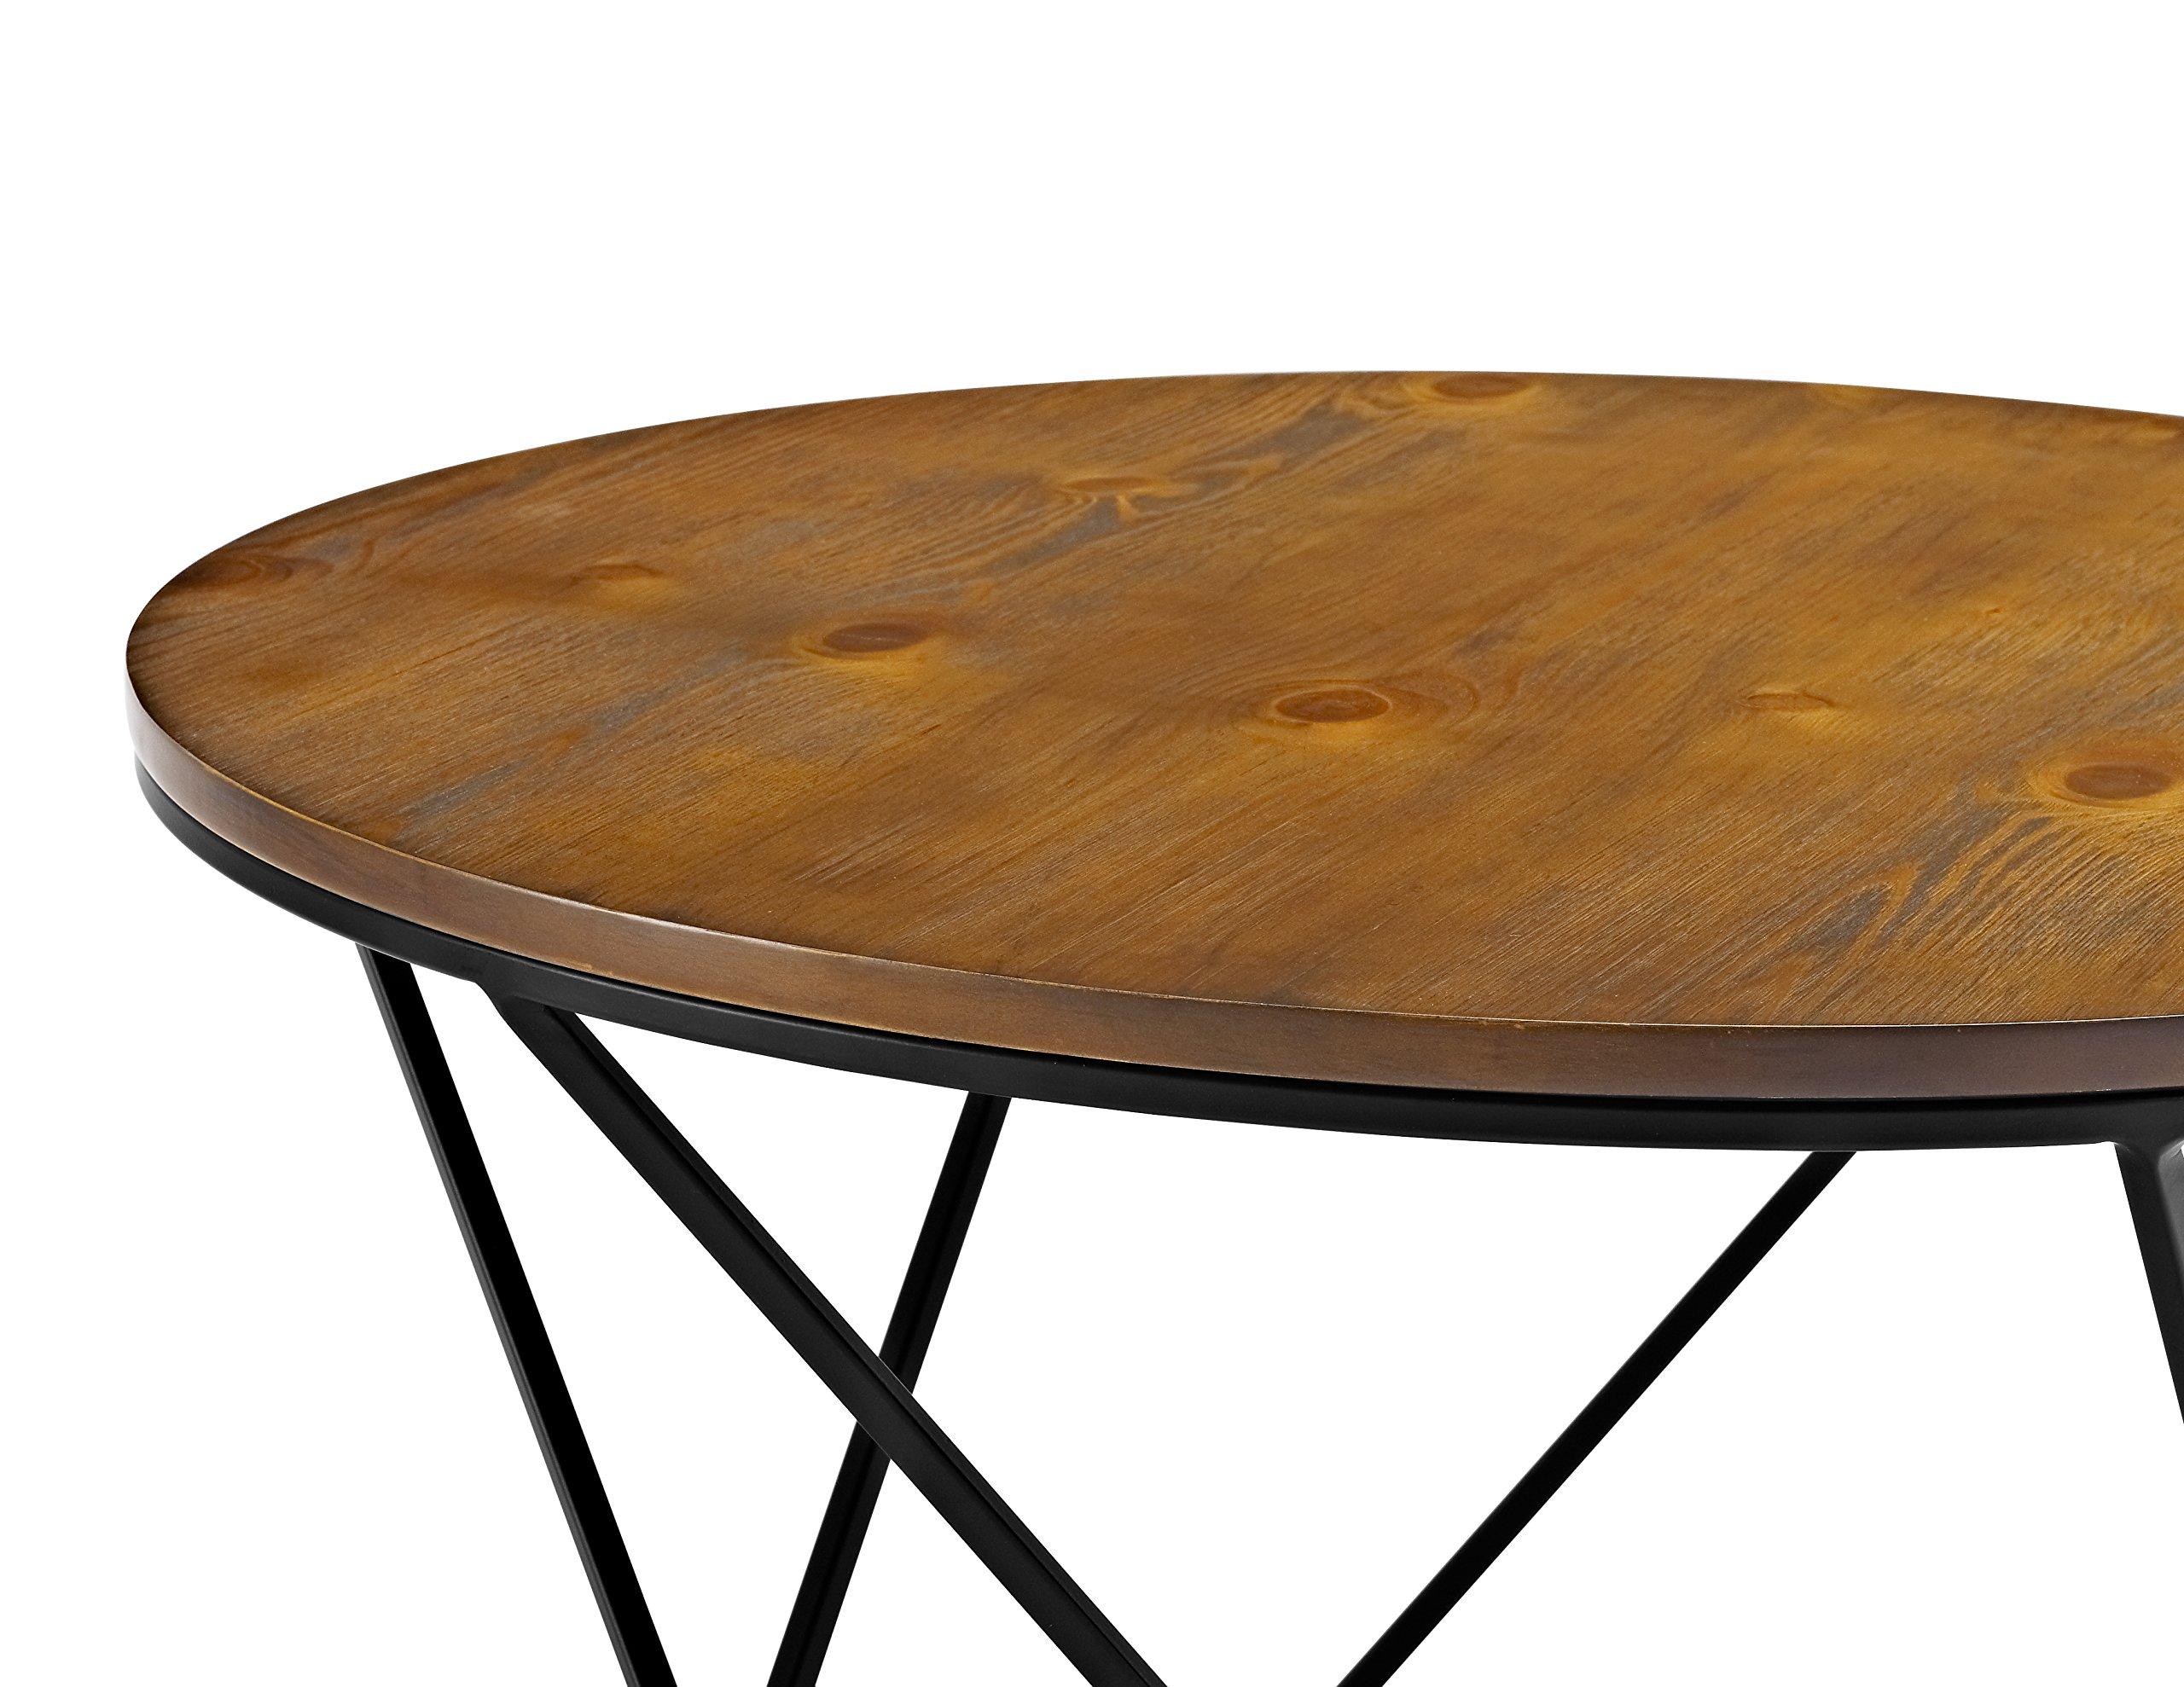 WE Furniture Geometric Wood Nesting Coffee Tables - Oak/Black by WE Furniture (Image #4)